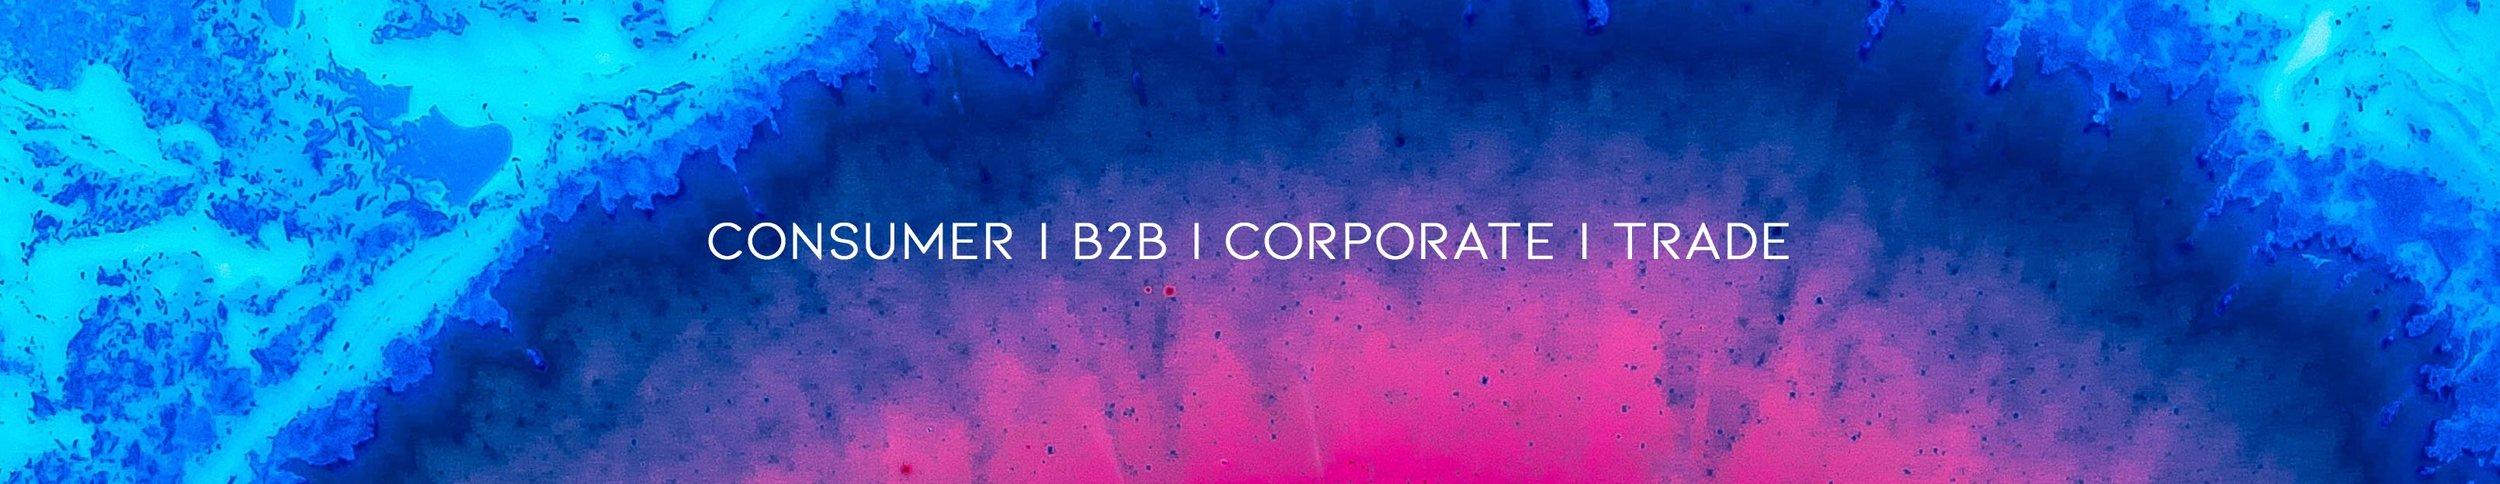 Consumer-b2b-corporate-trade-pr-communications.jpg